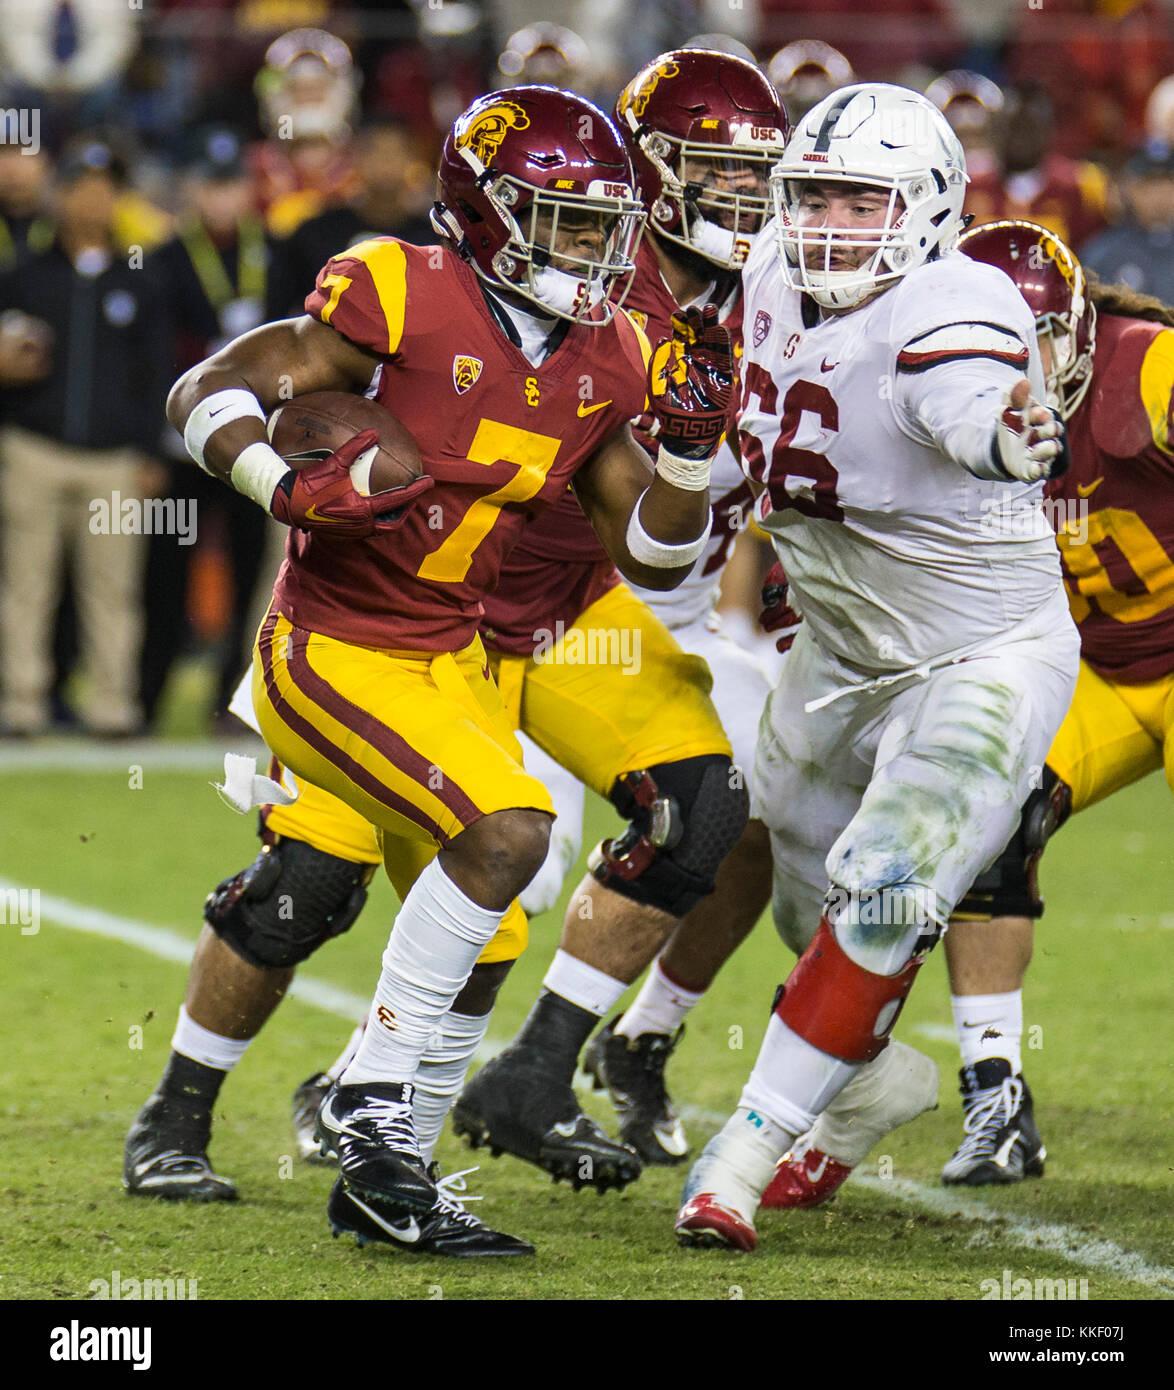 Dec 01 2017 - Santa Clara U.S.A CA USC running back Stephen Carr (7) run for a short gain during the NCAA Pac 12 - Stock Image